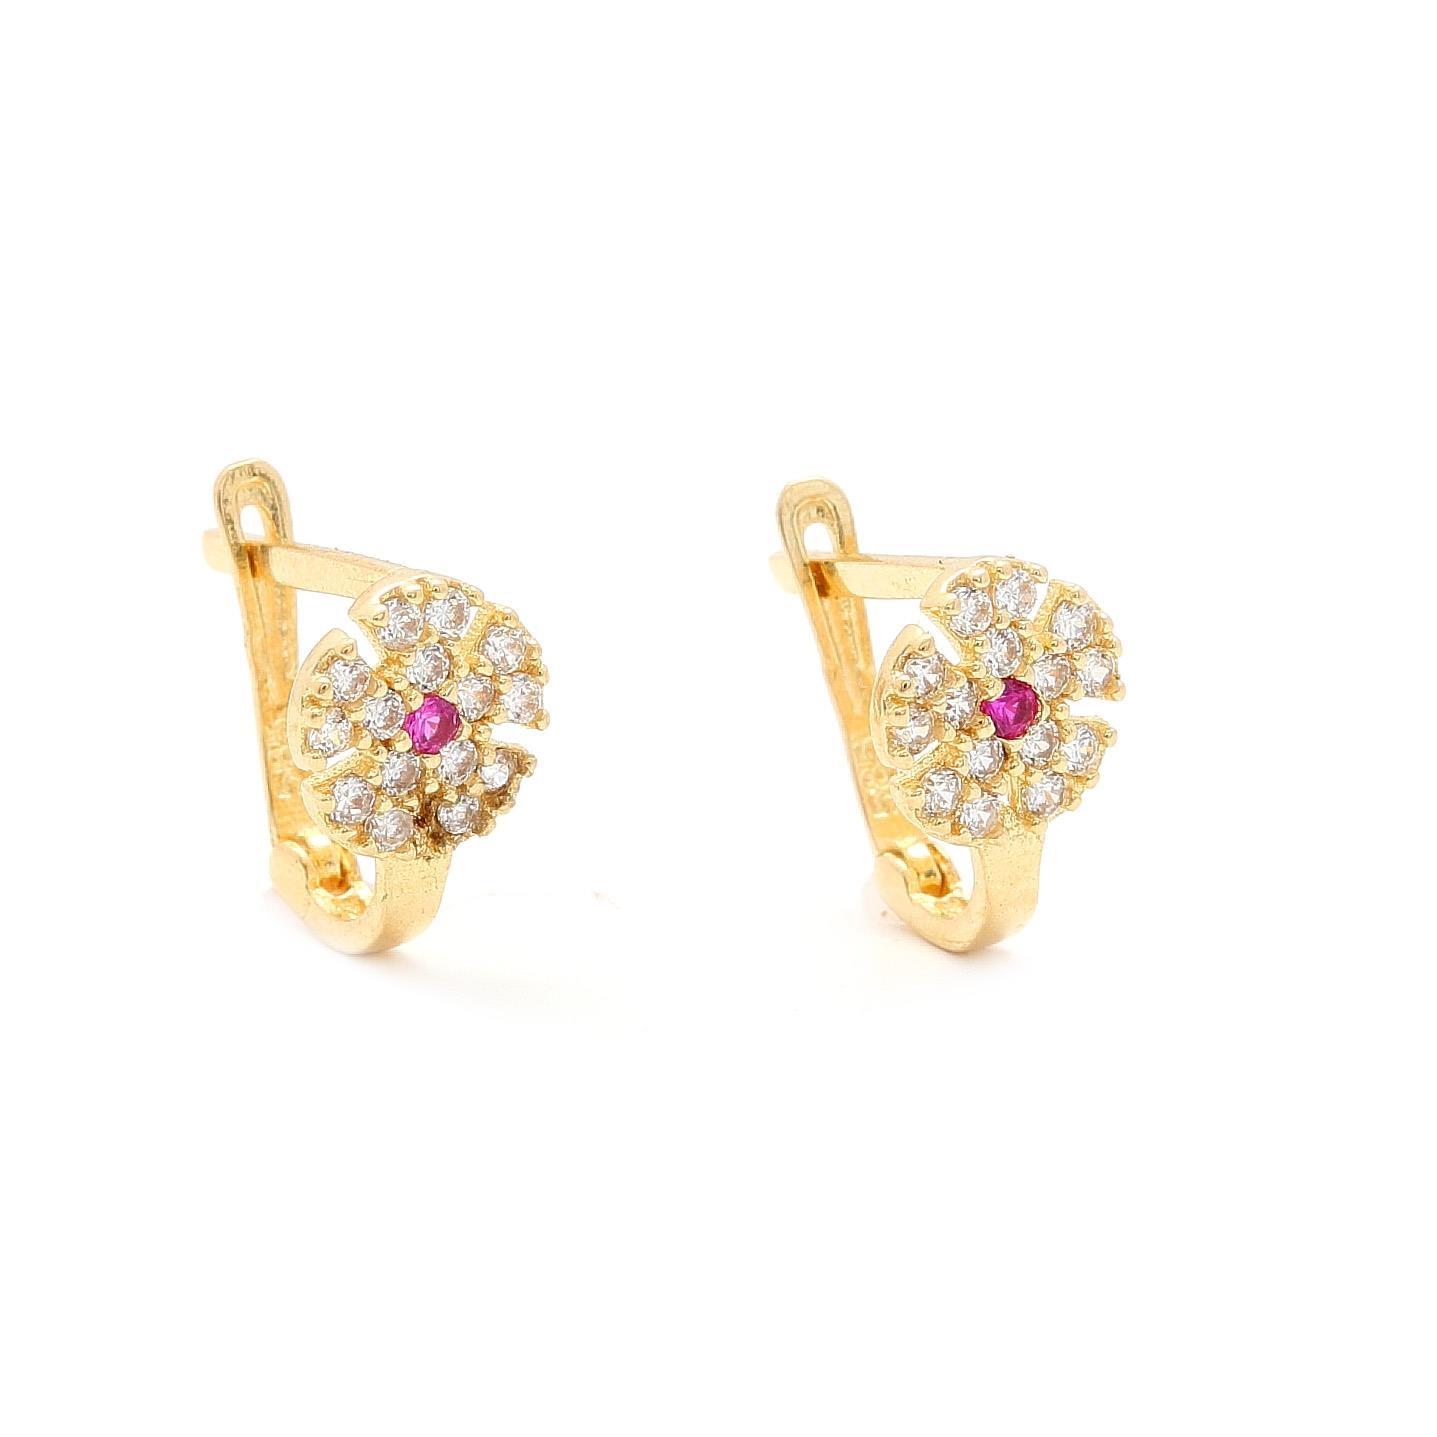 Zlaté náušnice ŽLTÝ KVET s ružovým kamienkom 6d8adc6aa05